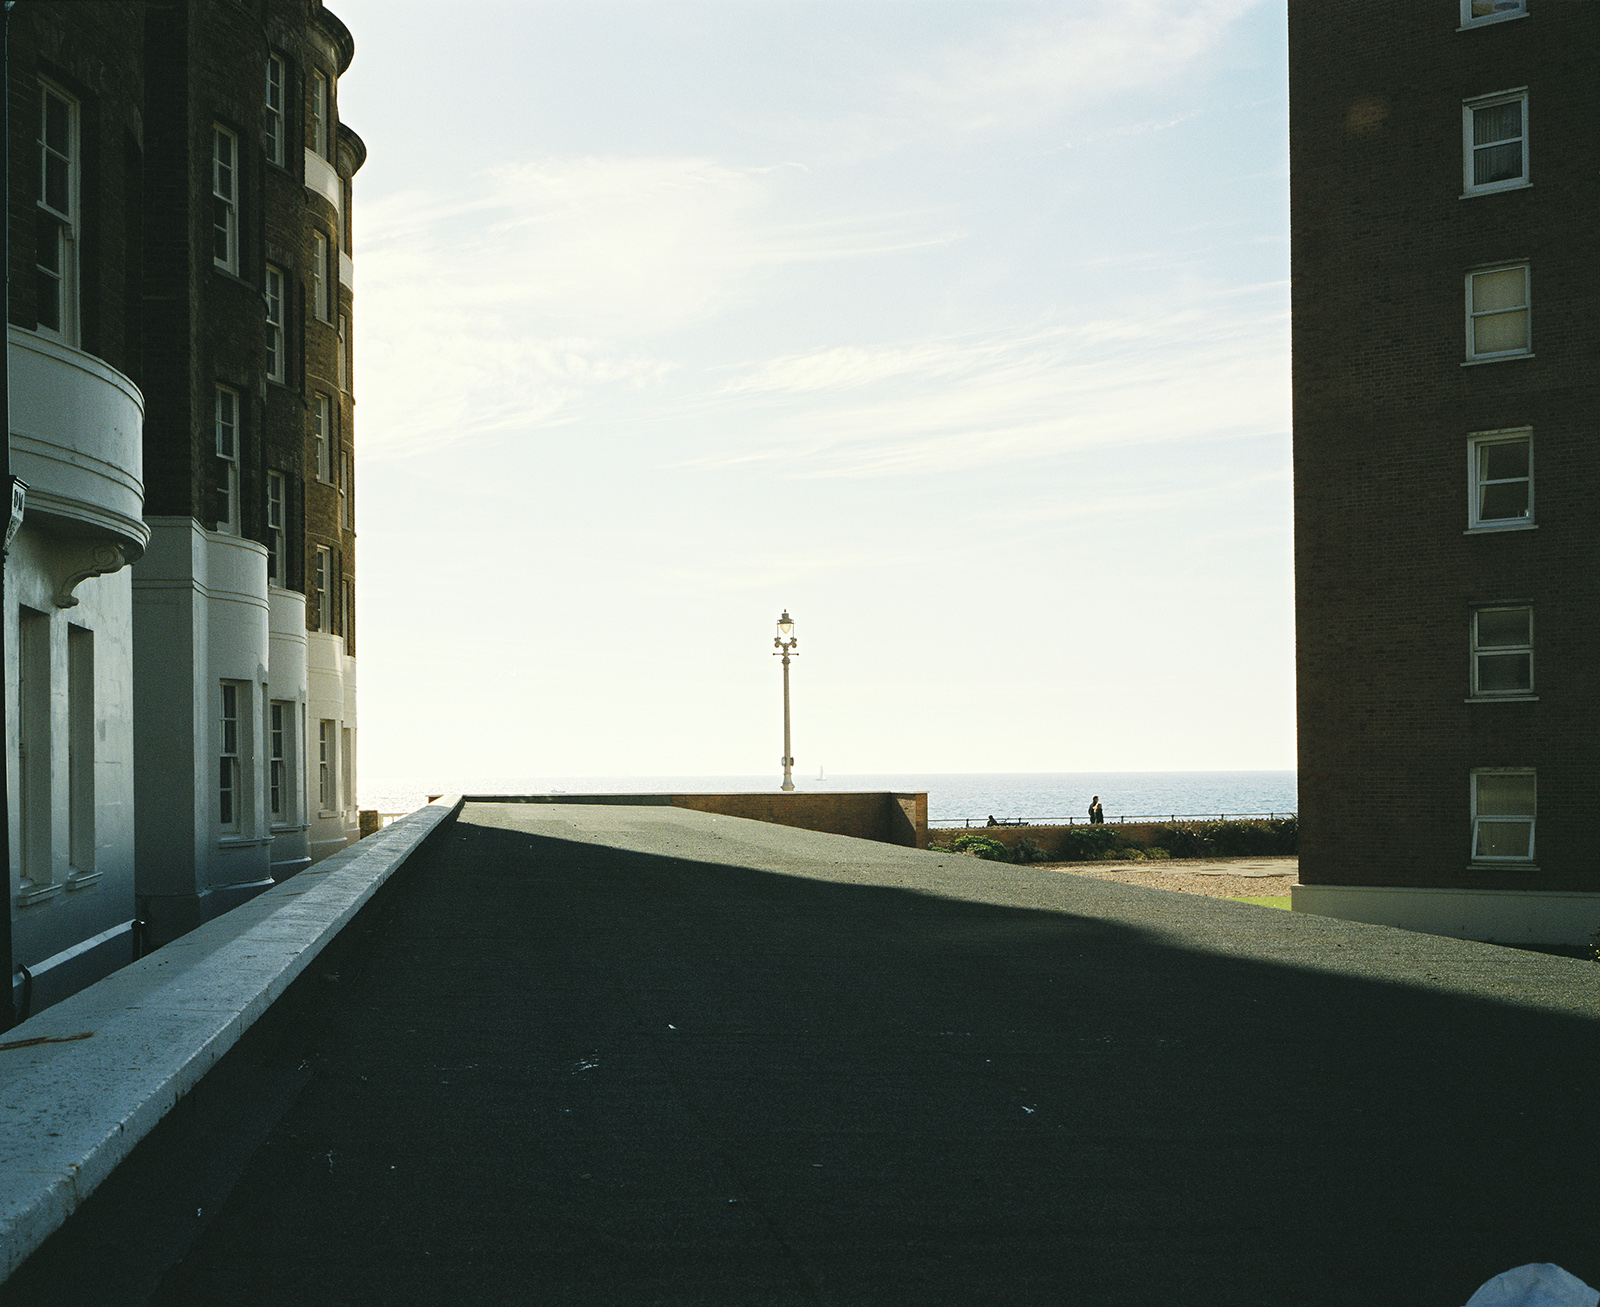 Brighton sea-front, UK 2006